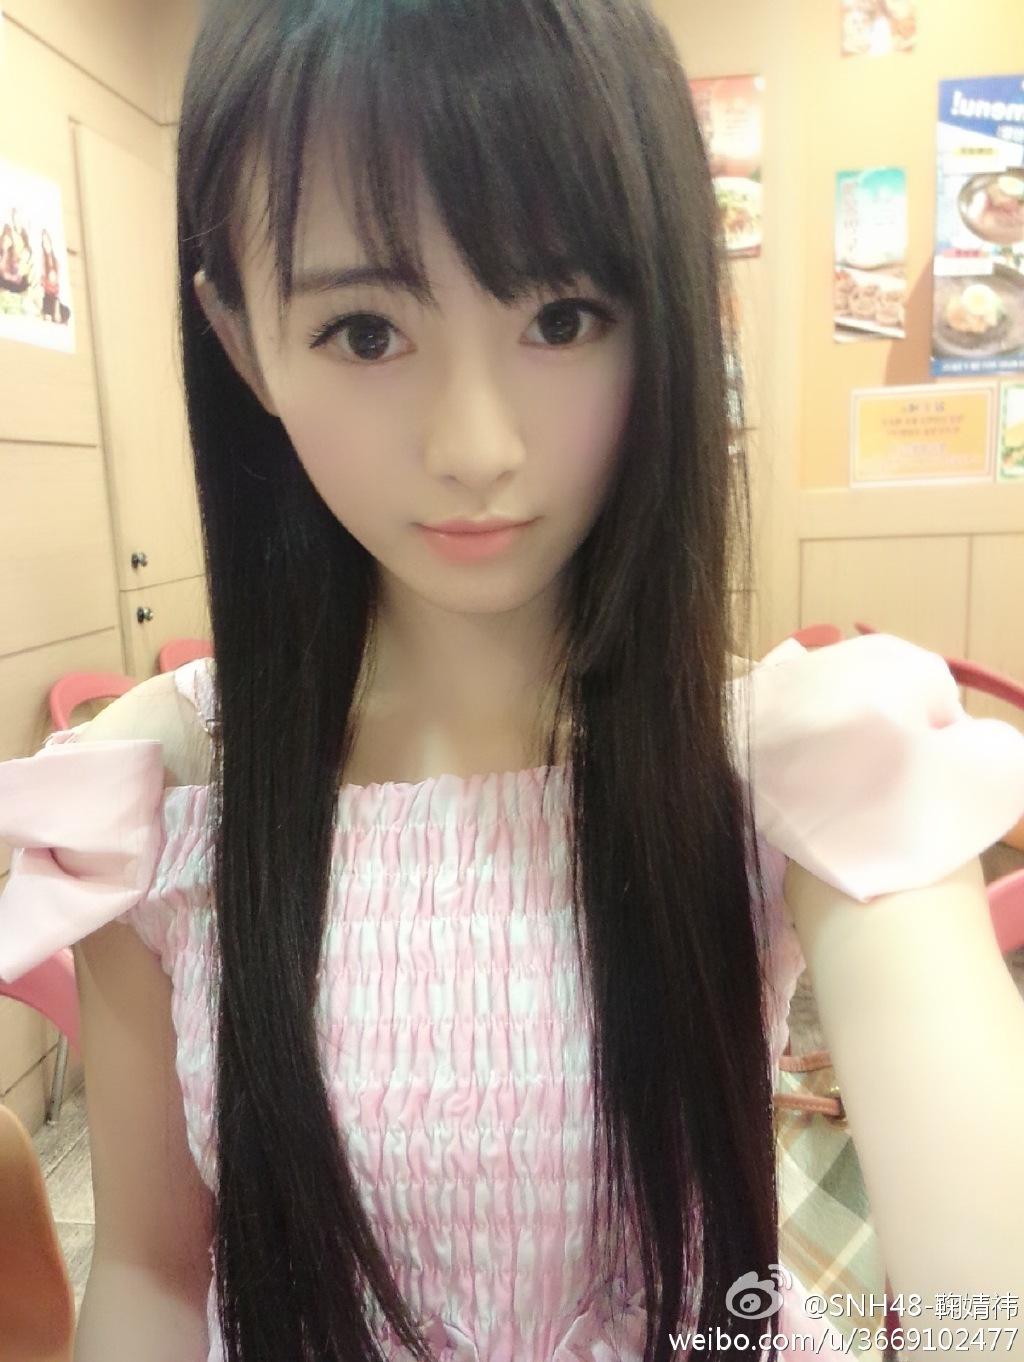 【SNH48】中国4000年に一人の美少女と話題の鞠婧禕(鞠ちゃん)のプロフィールを更新しました